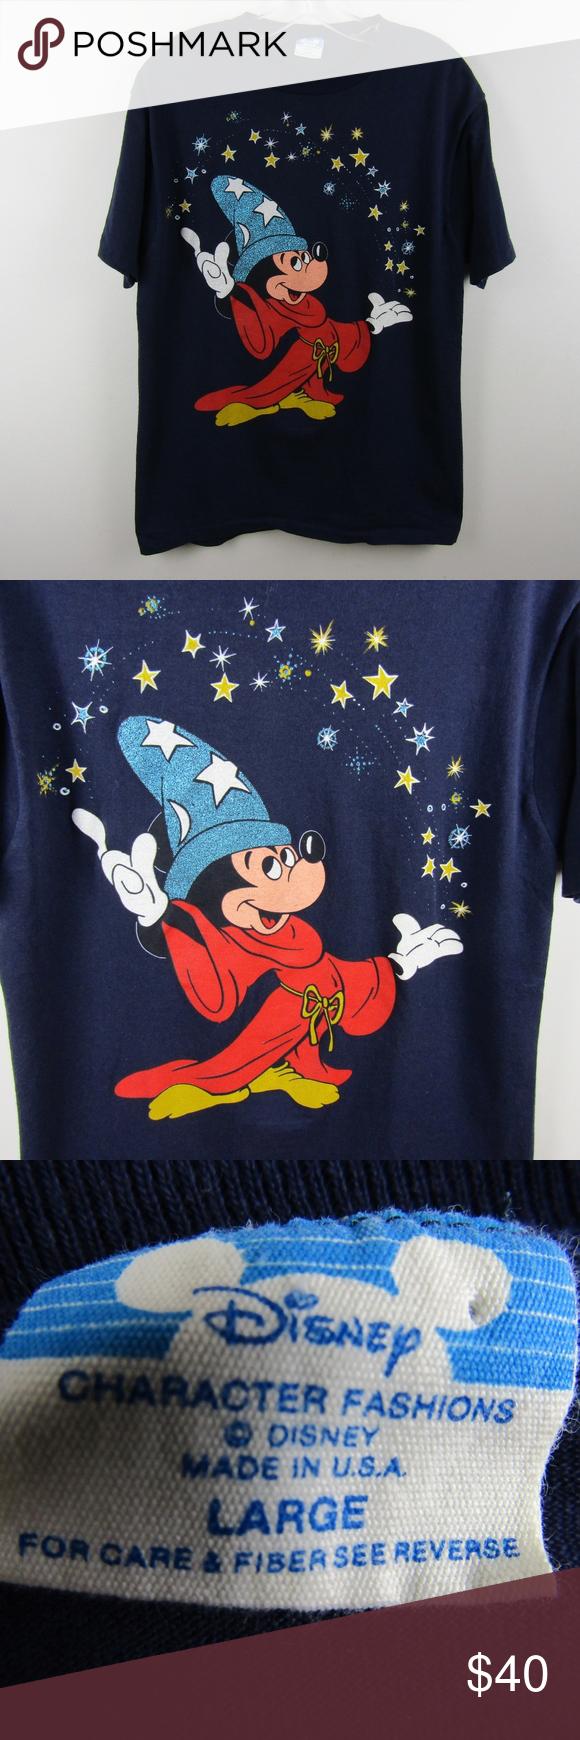 Vintage Disney Fantasia Wizard Mickey Shirt Large Vintage Disney Mickey Shirt Fantasia Disney